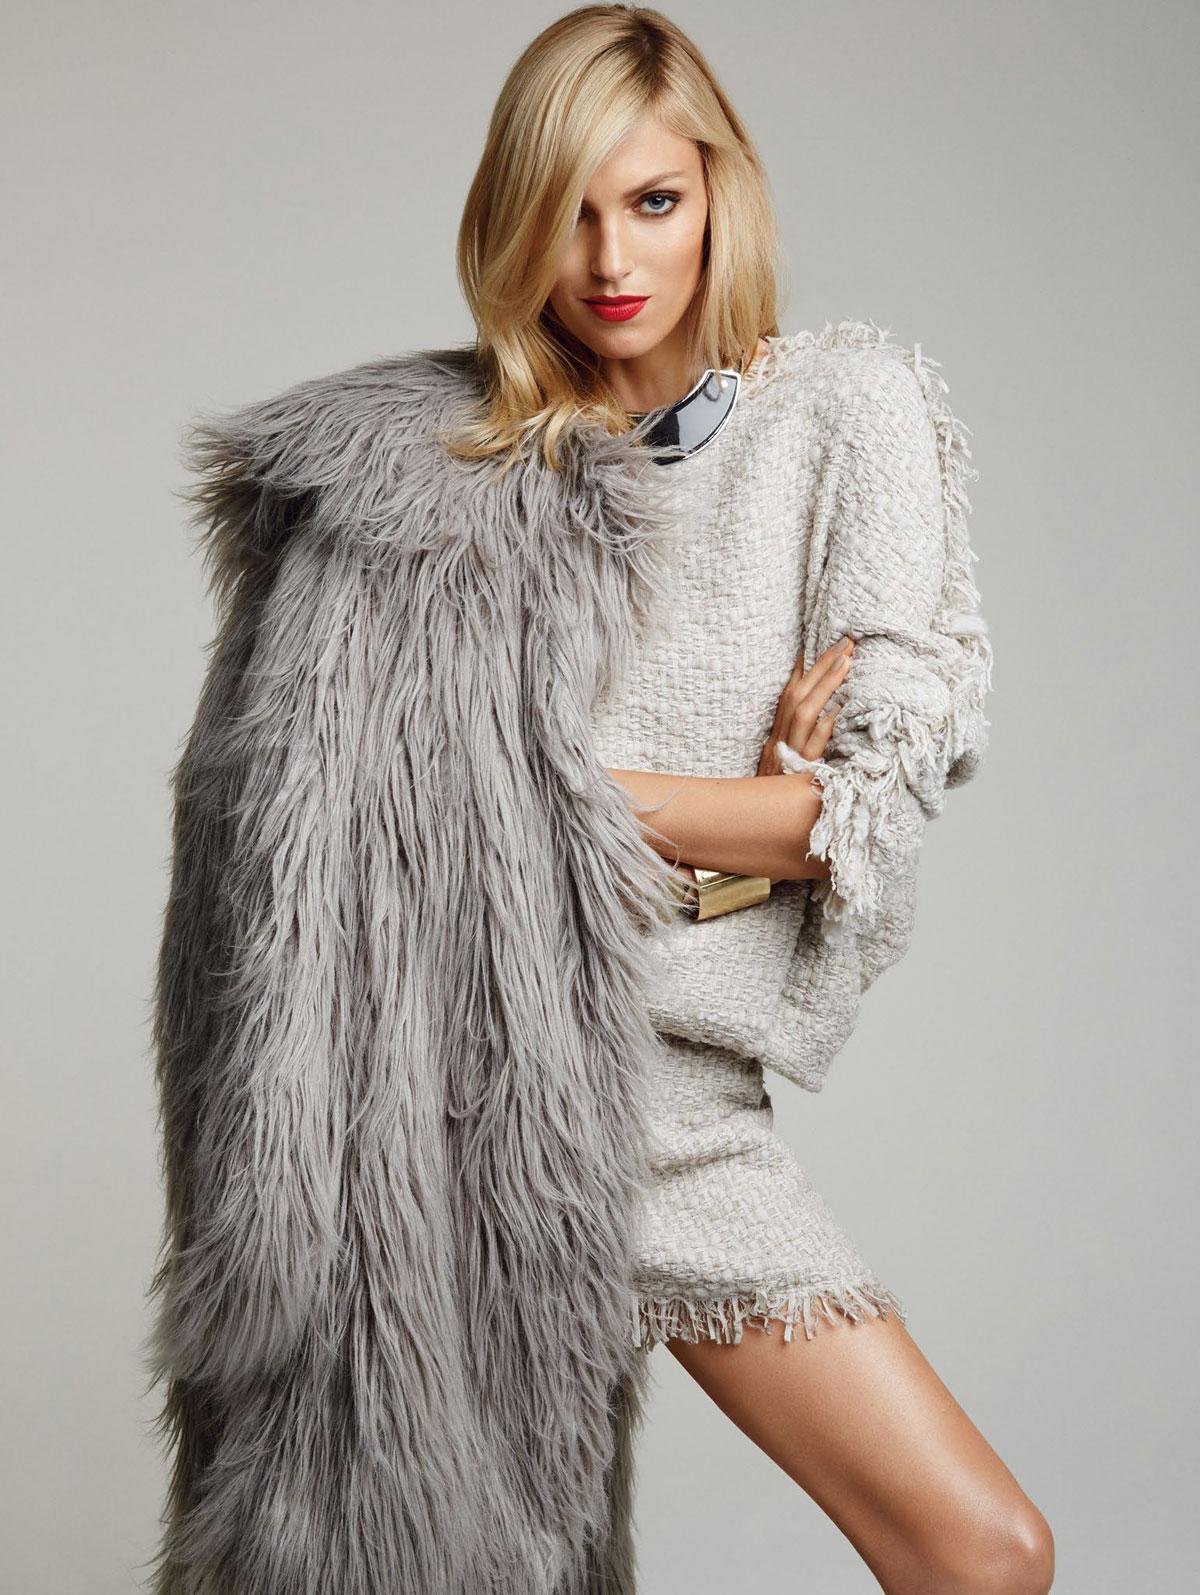 ANJA RUBIK Vogue Magazine Photoshoot By Patrick